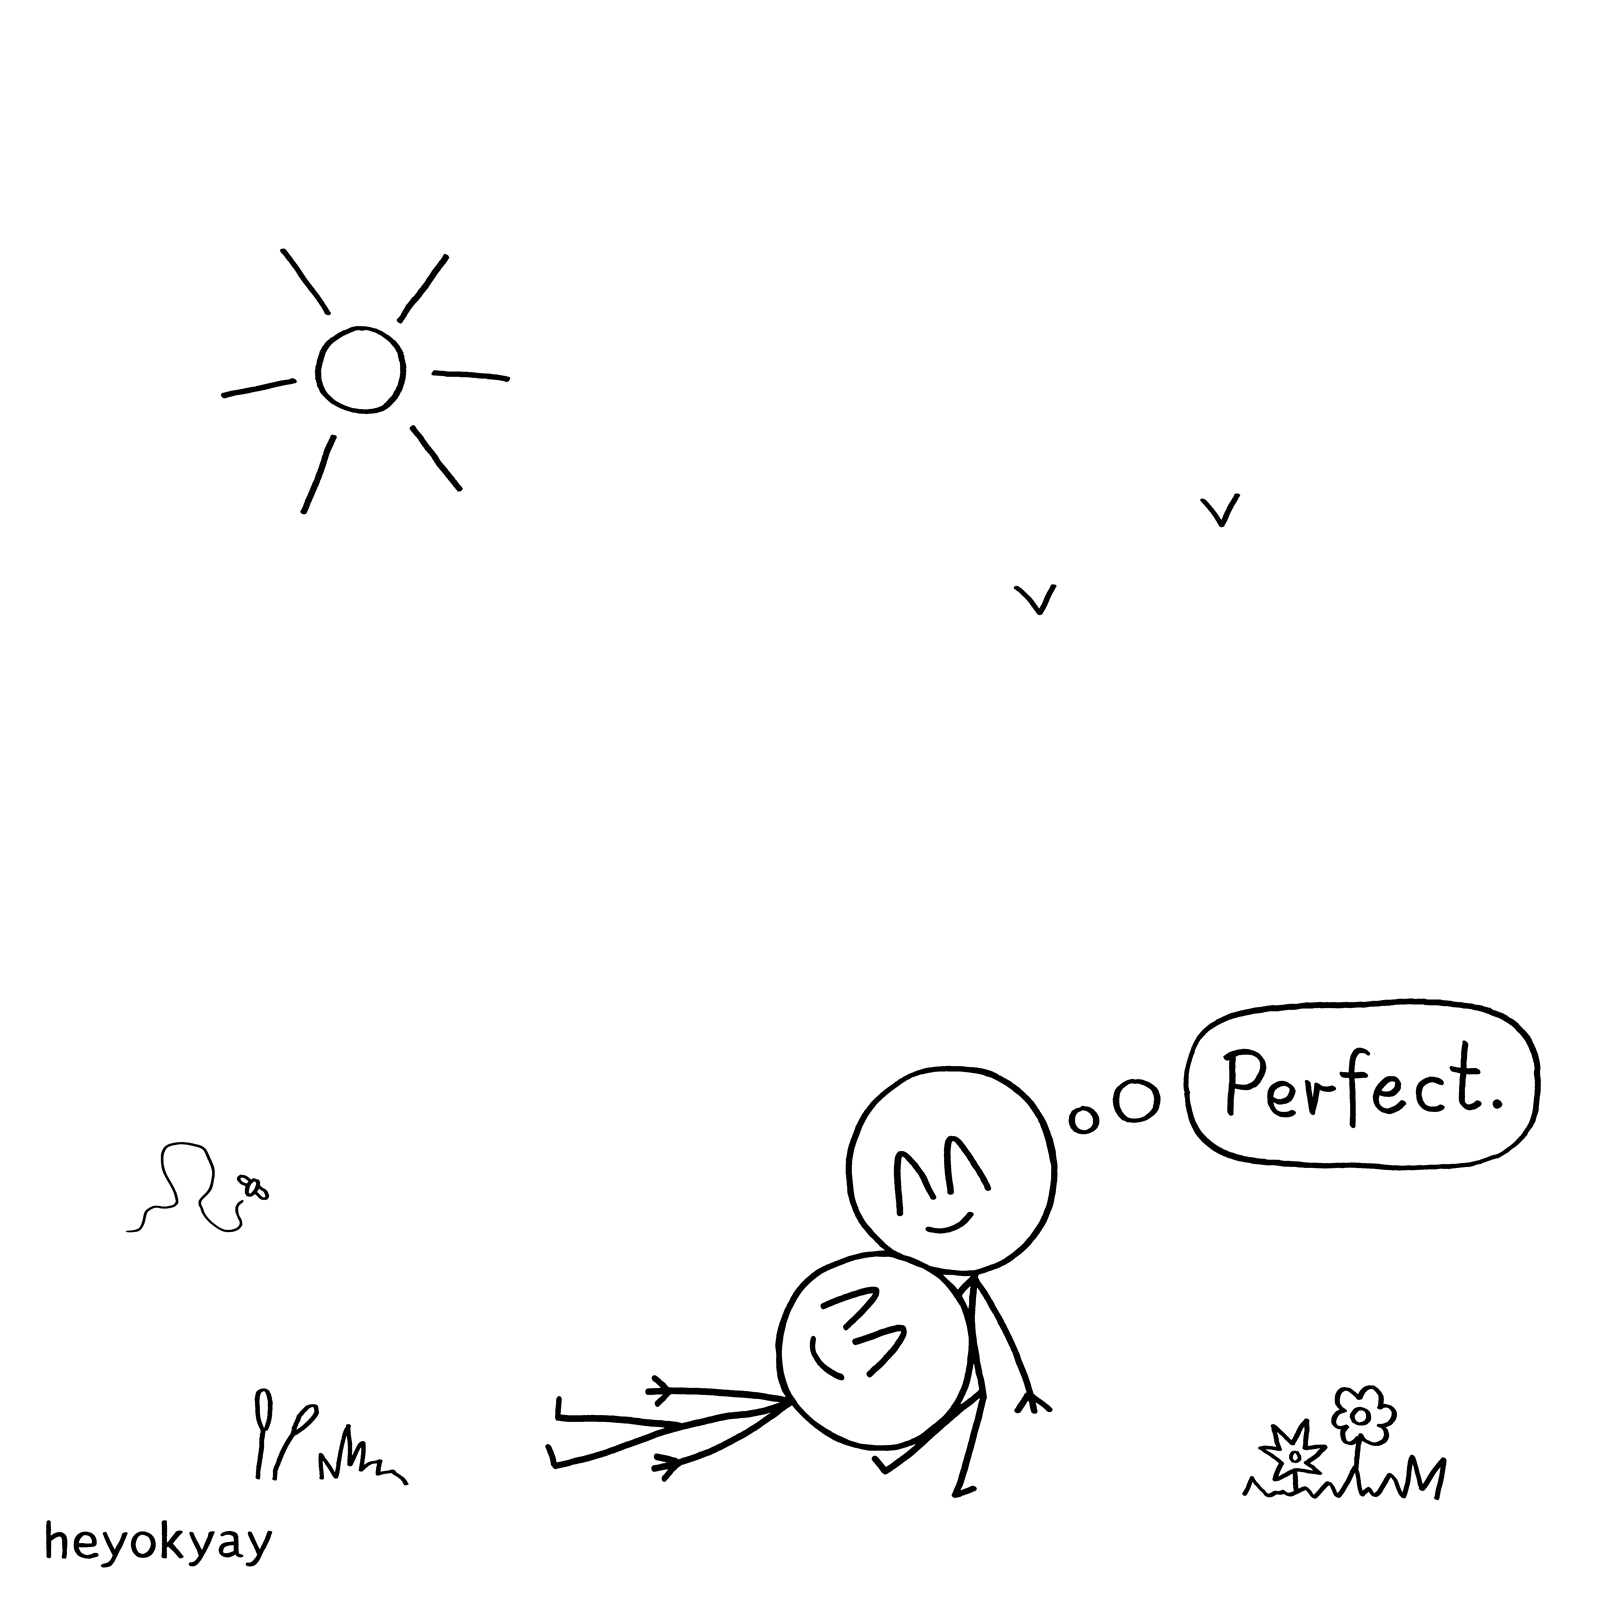 Perfect Summer heyokyay comic